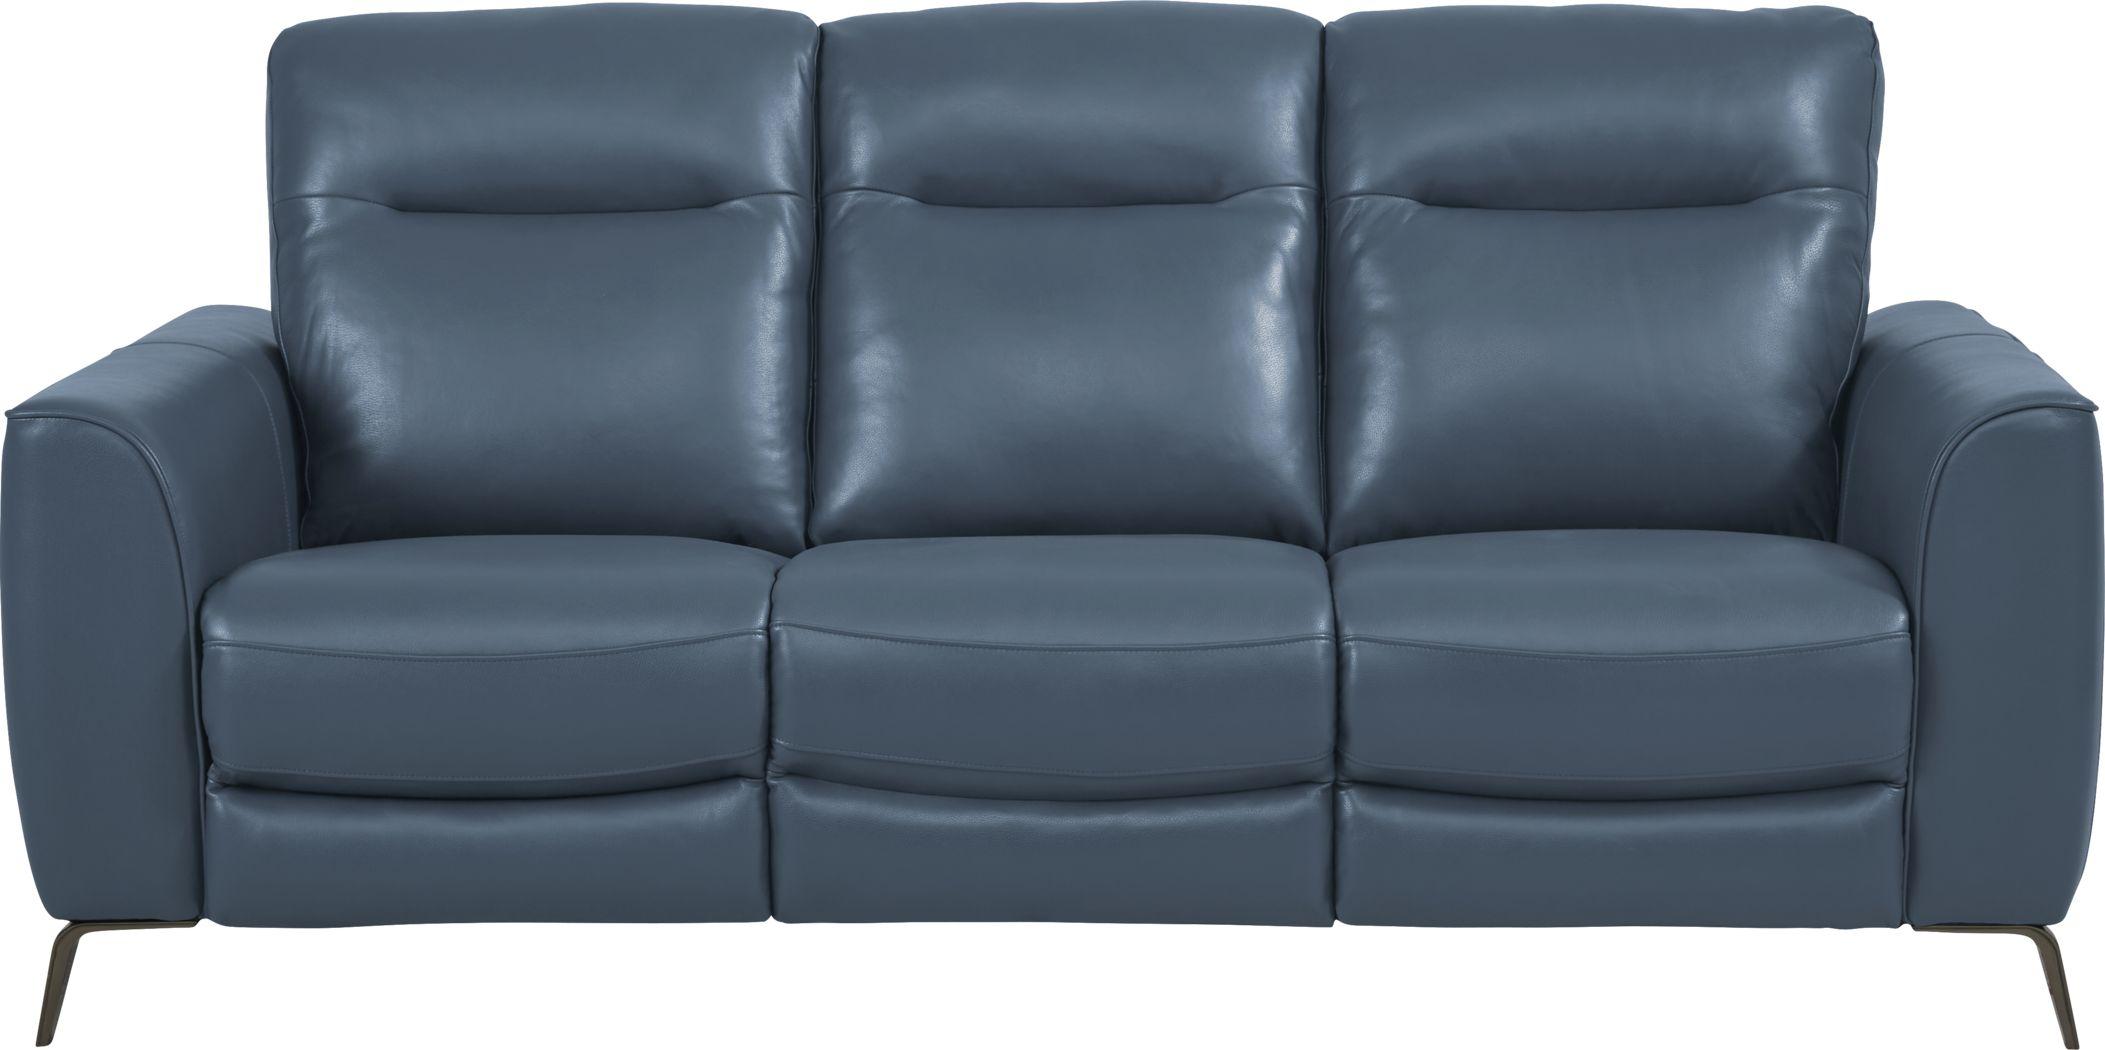 Calabra Ocean Leather Dual Power Reclining Sofa